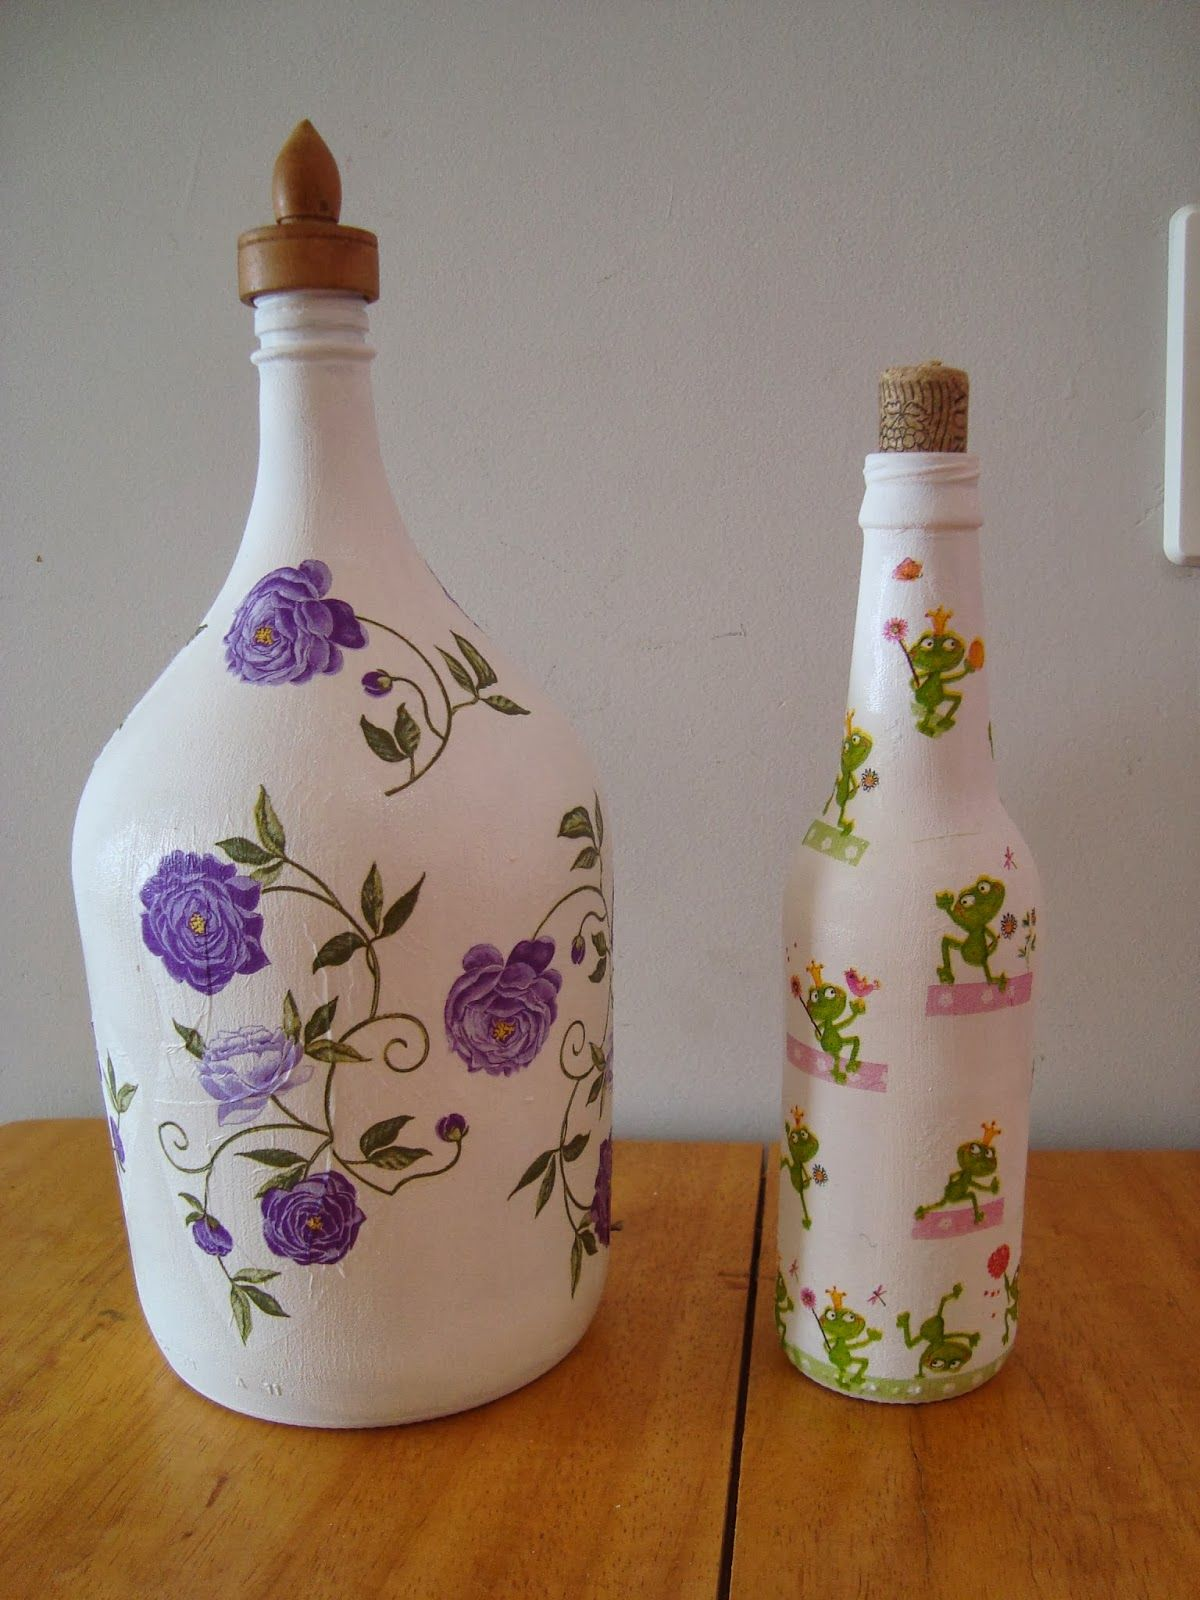 Adesivo Tema Festa Junina ~ Rosa Luiza Artesanatos Vidro ou garrafa de suco de uva ou vinho, decorados com guardanapo de